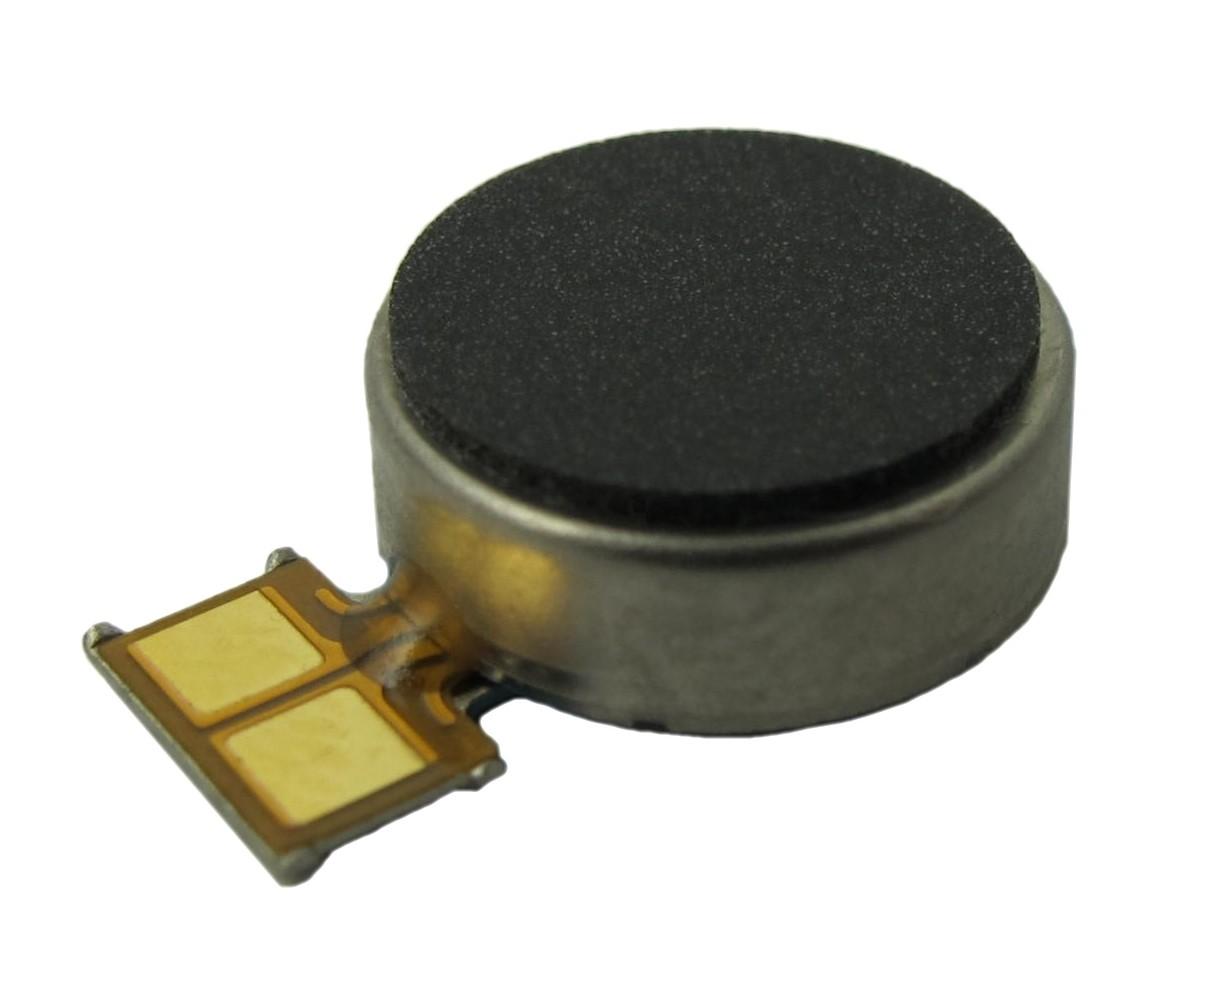 C0830B009L Coin Vibration Motor